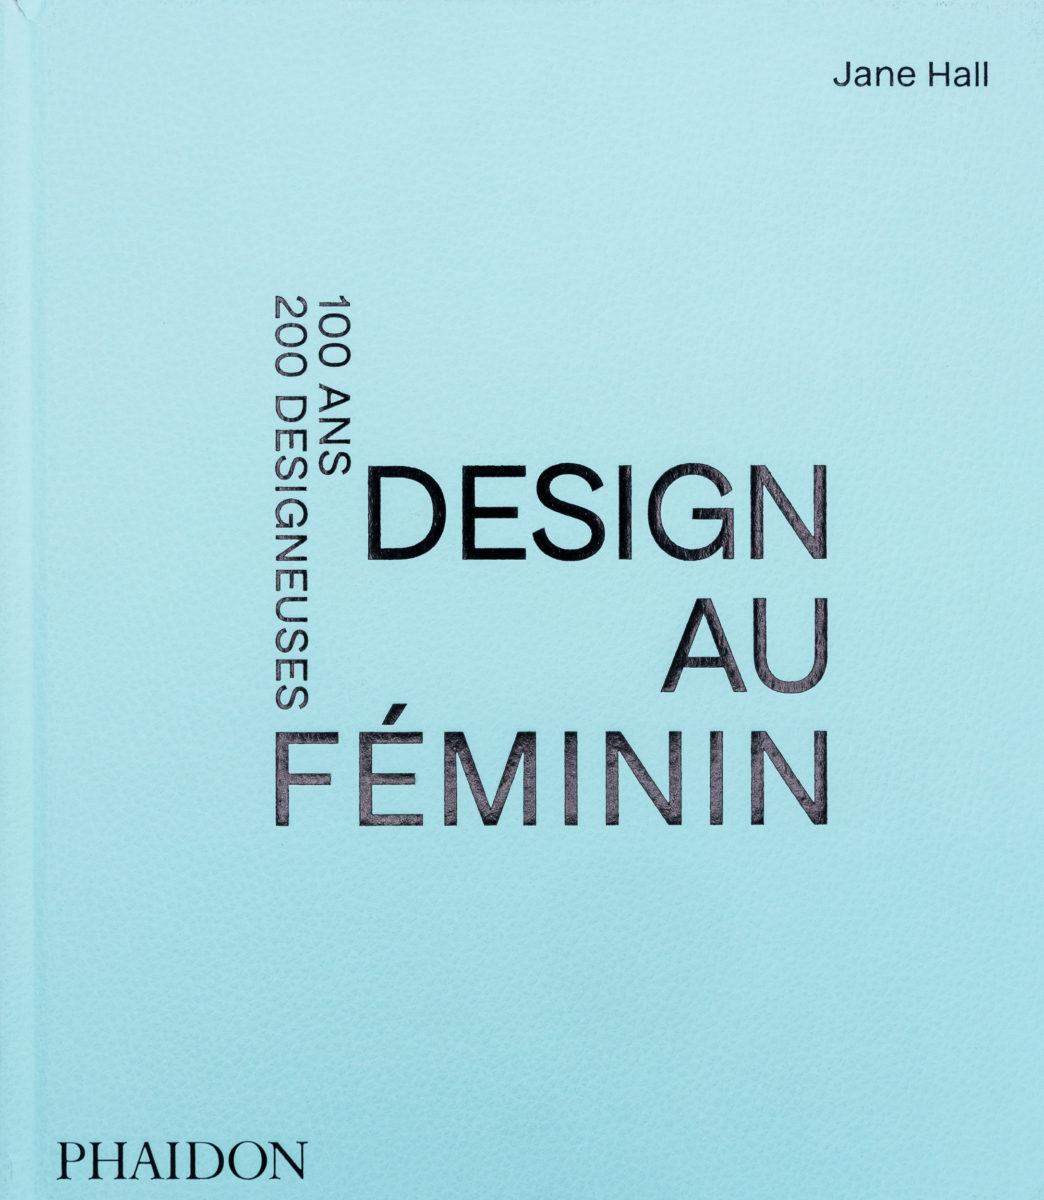 Jane Hall, Design au féminin - 100 ans 200 designeuses